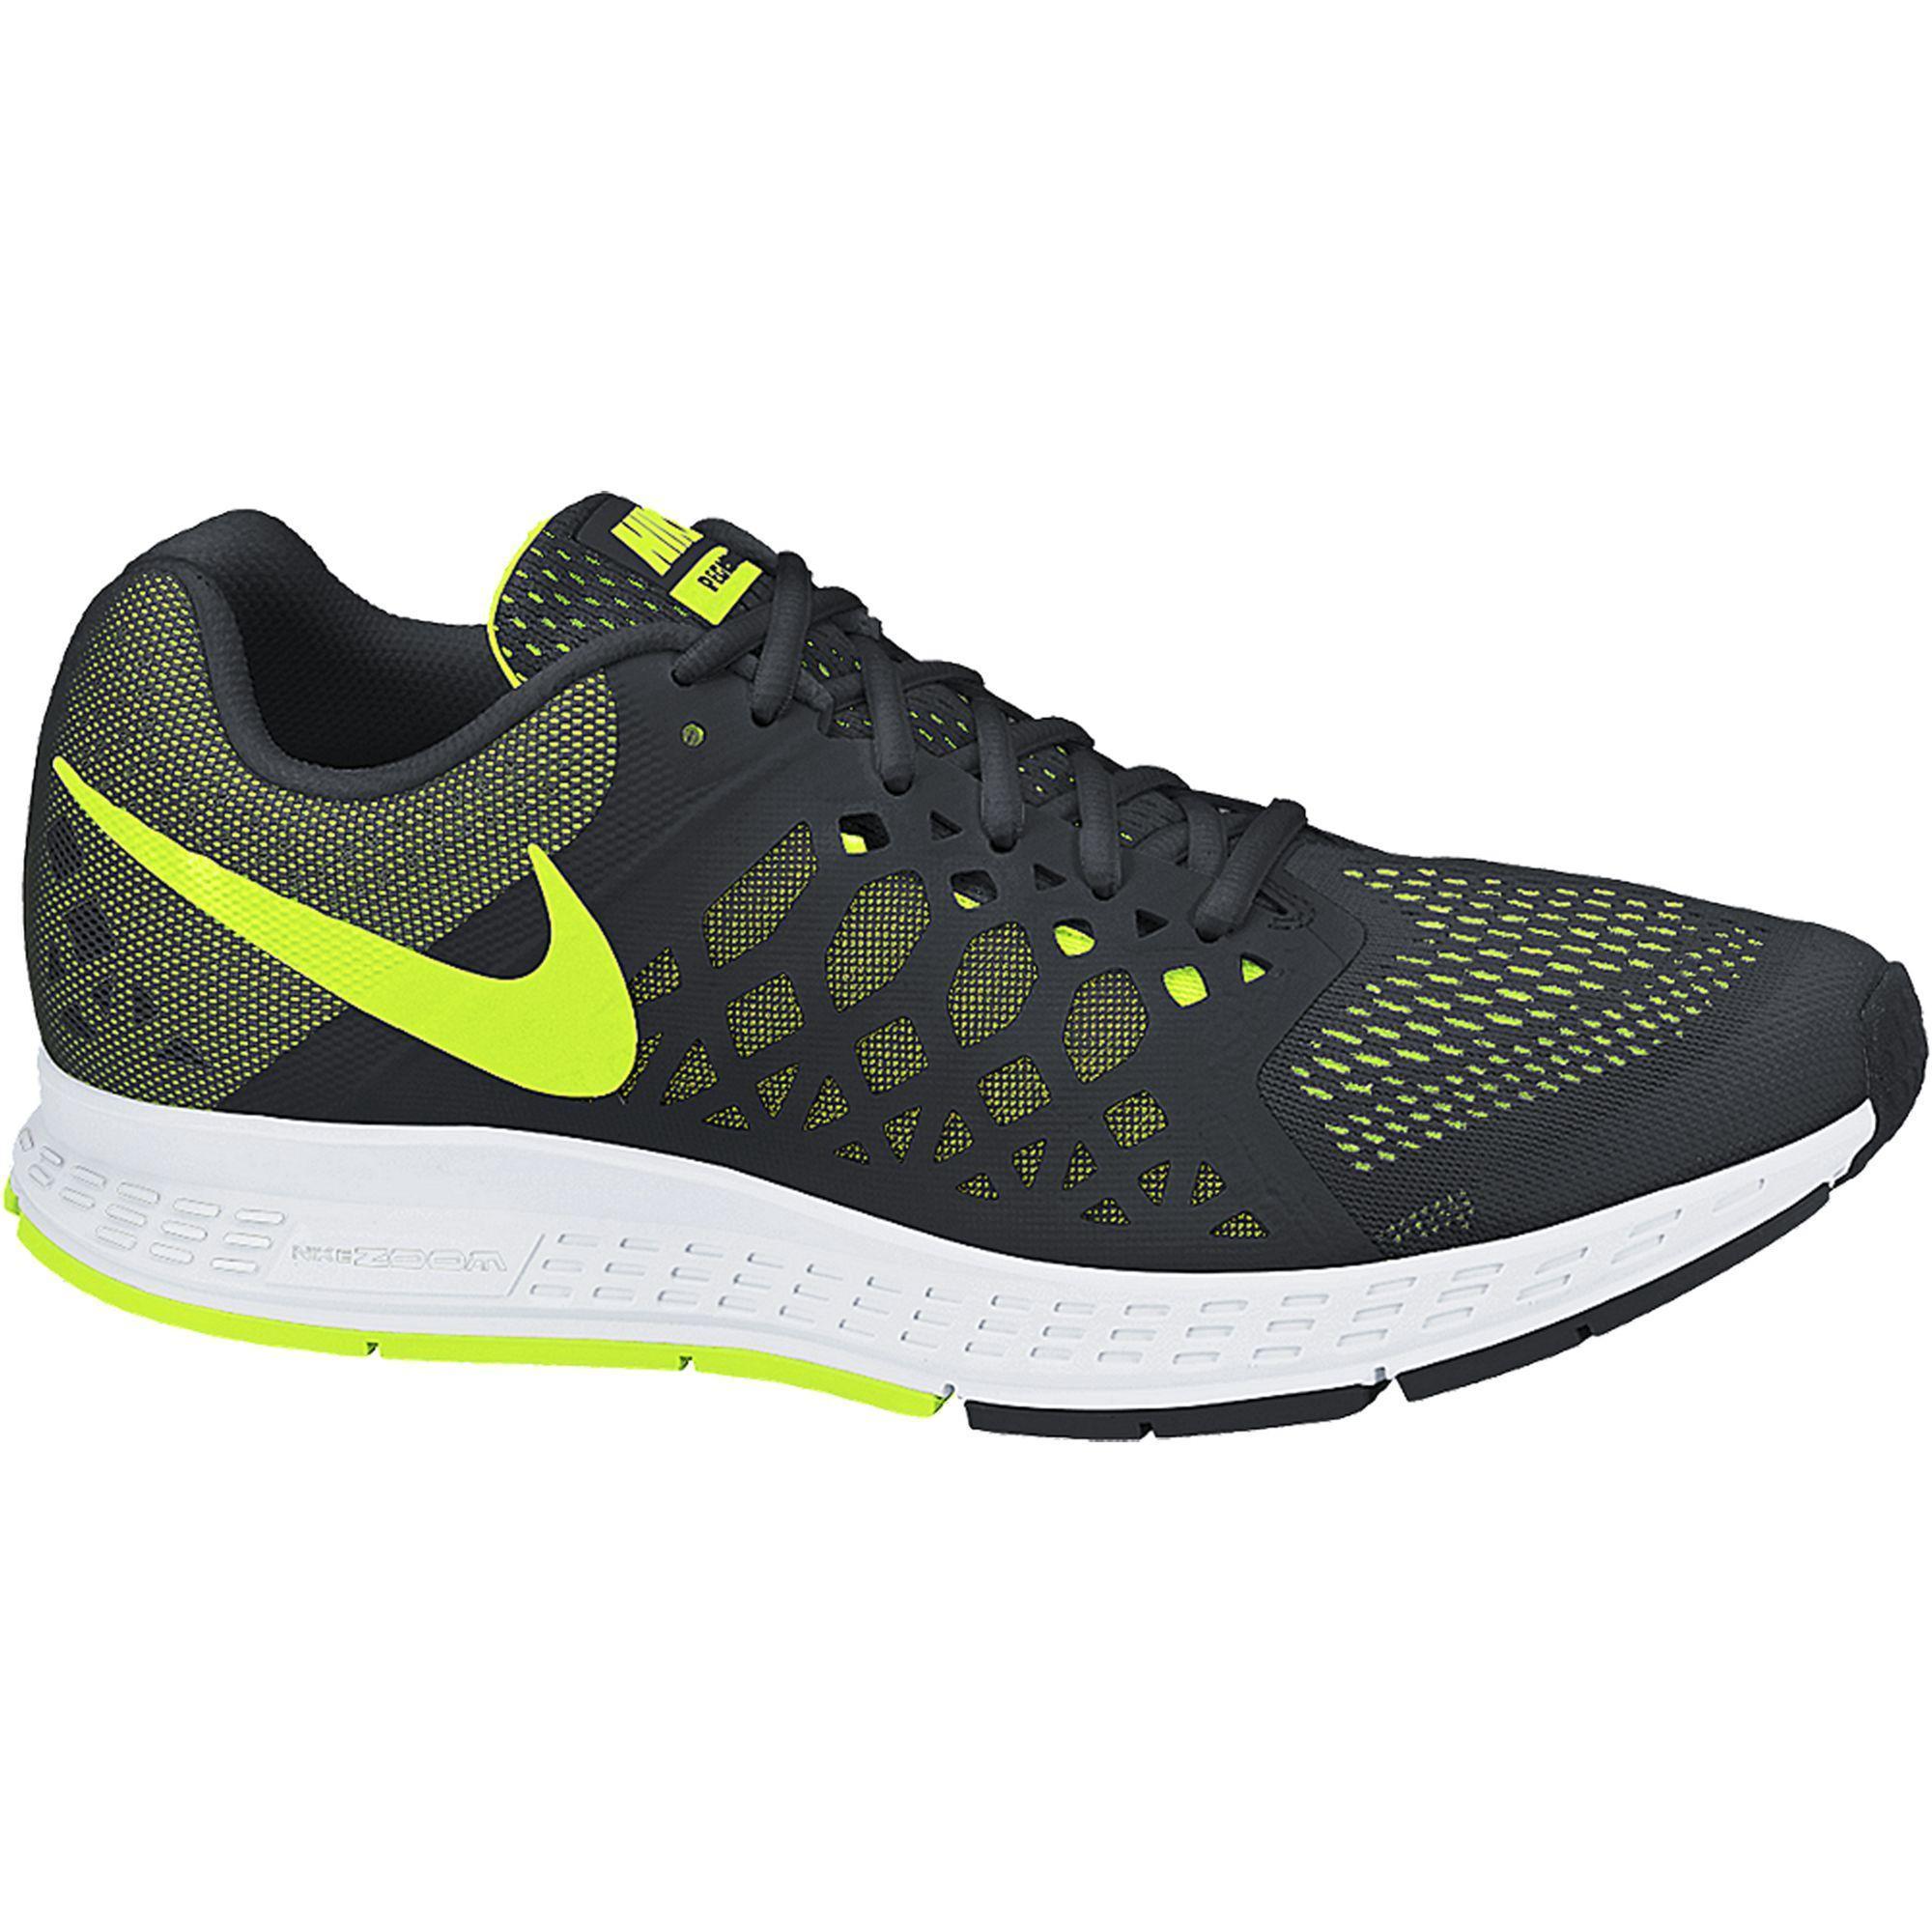 premium selection 75d3f 7b963 Nike Mens Air Zoom Pegasus+31 Running Shoes - Black Volt - Tennisnuts.com